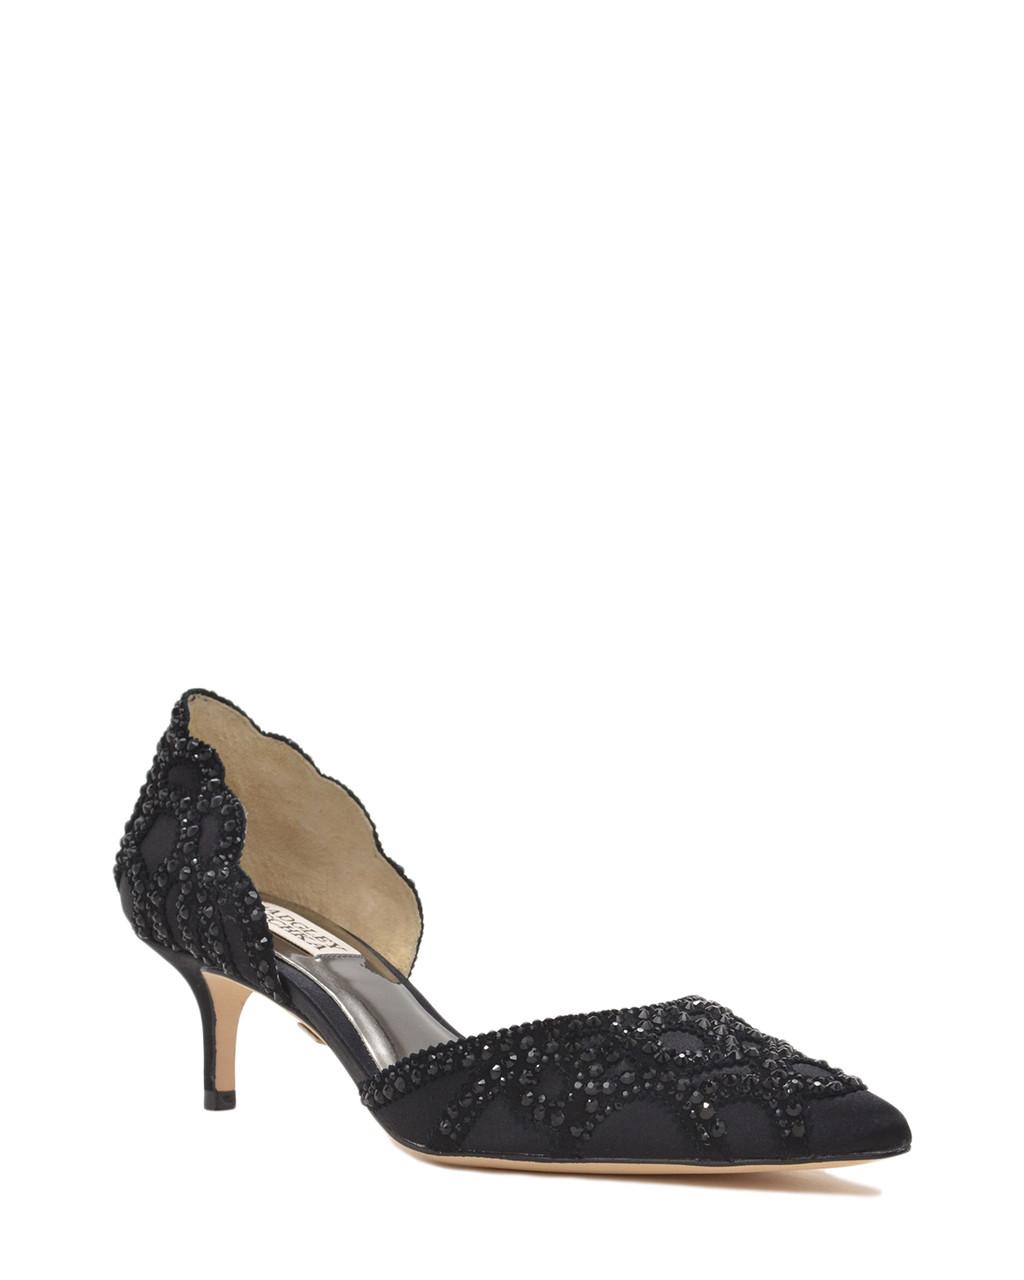 369dd27fbd Ginny Pointed Toe D'Orsay Evening Shoe by Badgley Mischka